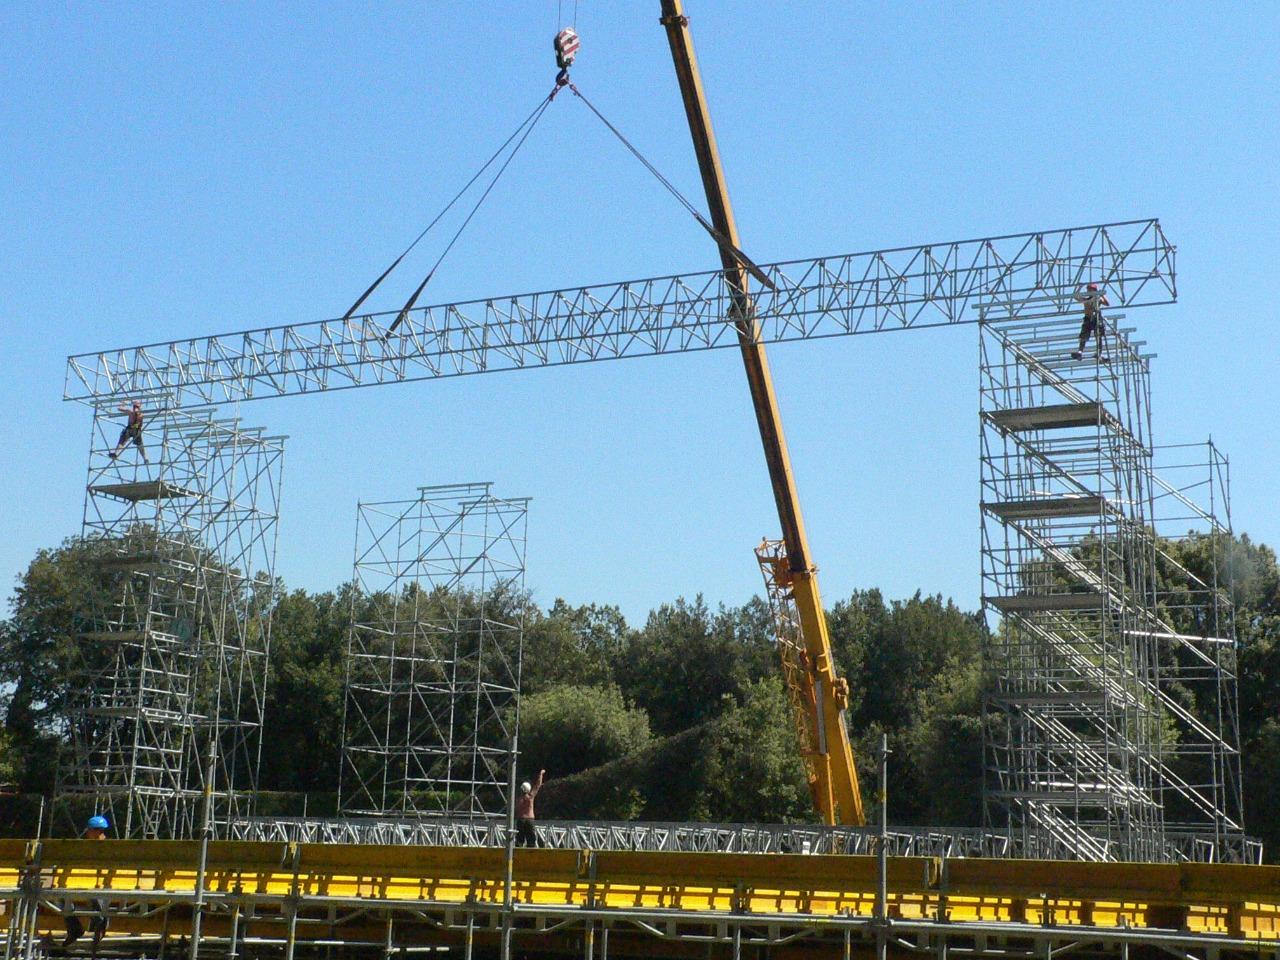 Gallery foto n.1 TMC beams for coverage - Opera festival